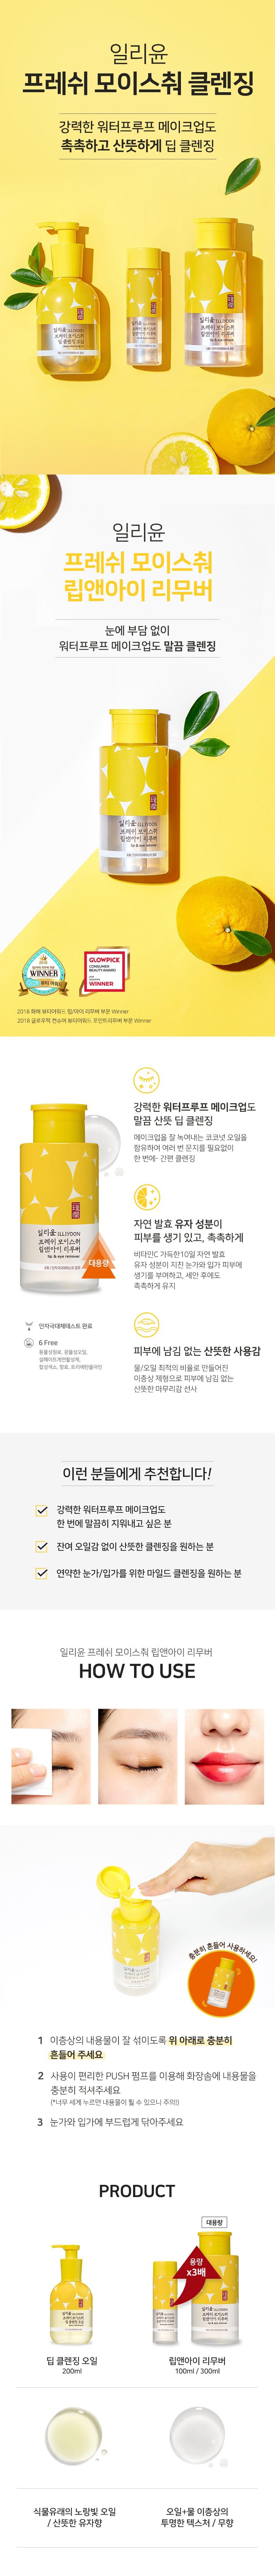 ILLIYOON Fresh Moisture Lip & Eye Remover korean cosmetic product online shop malaysia chiana usa.jpg1